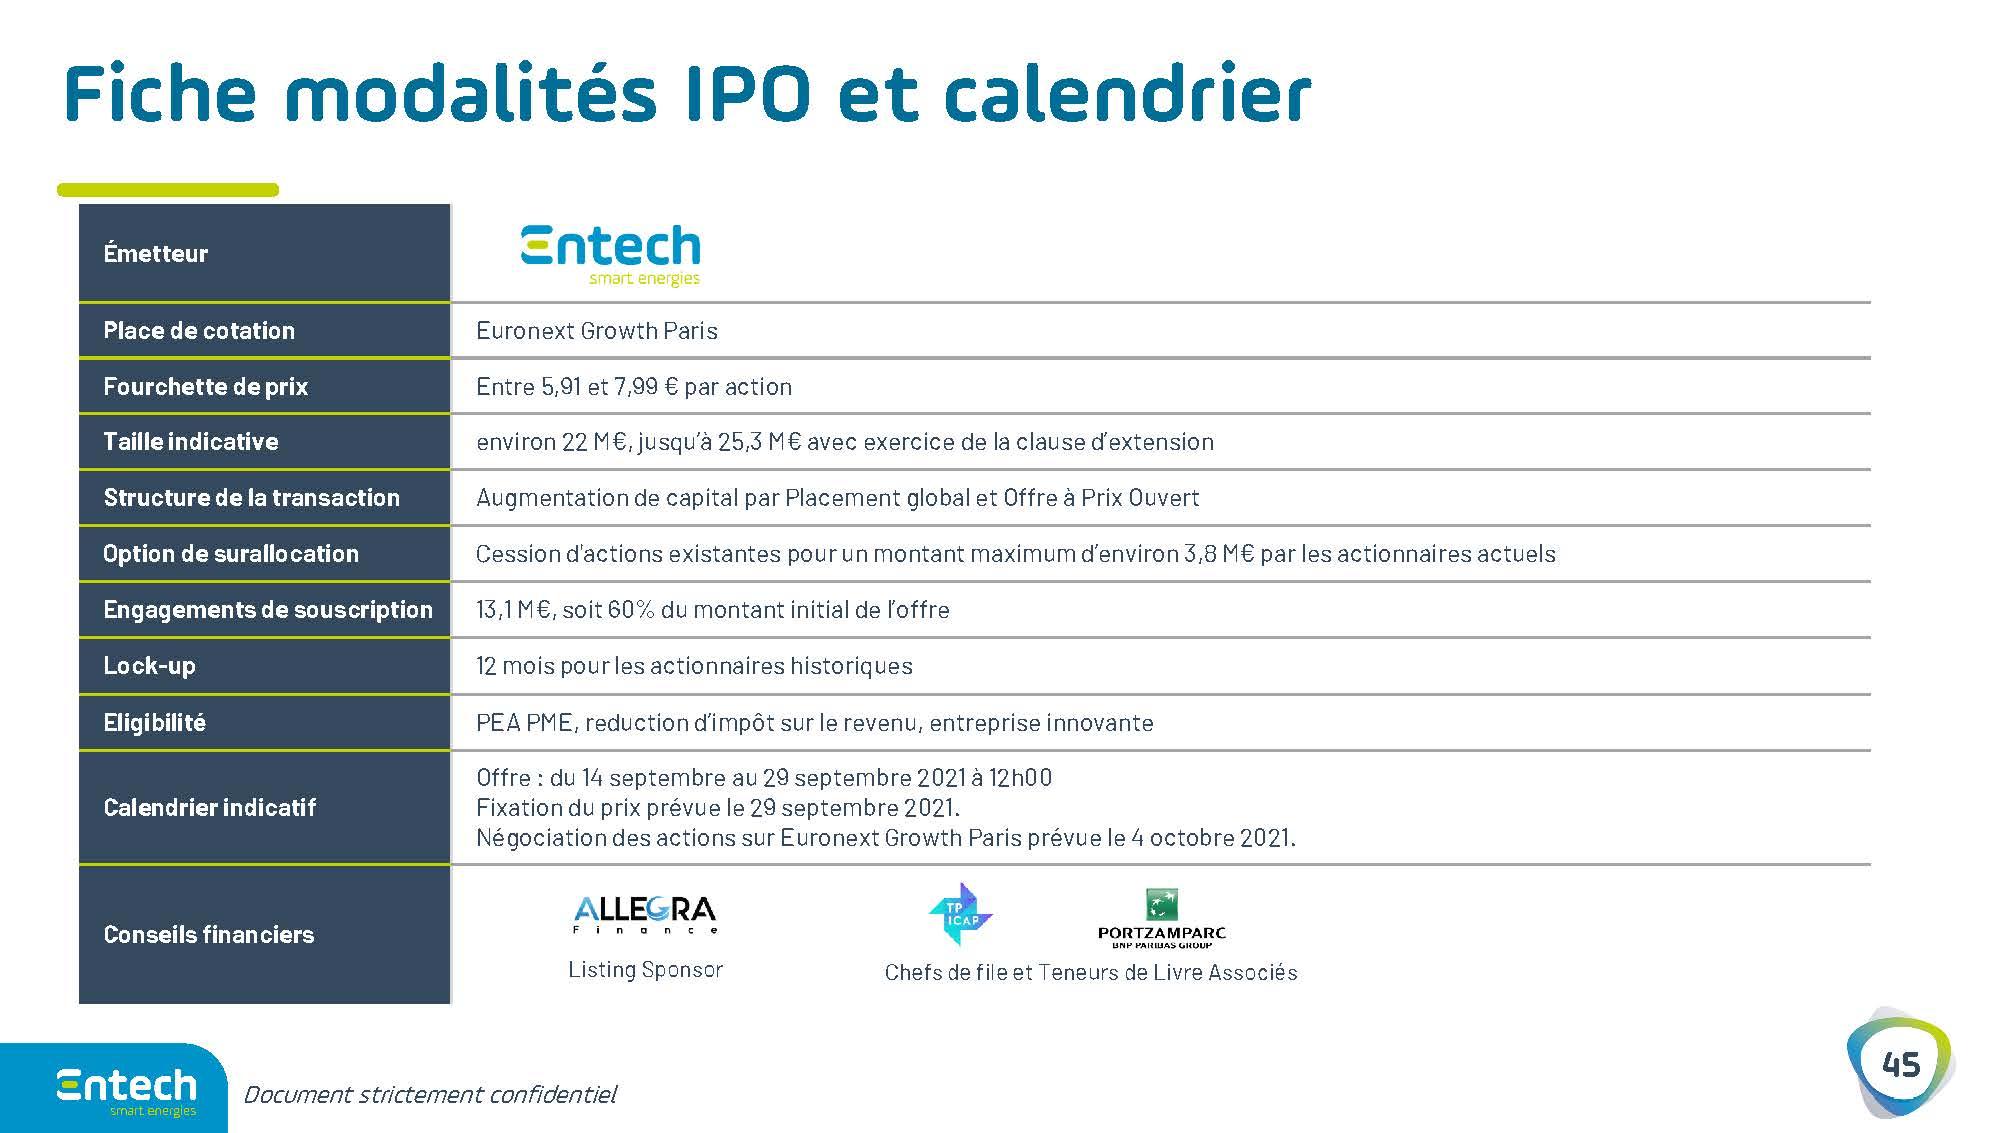 ENTECH_PRES_IPO_210914_FR_Page_45